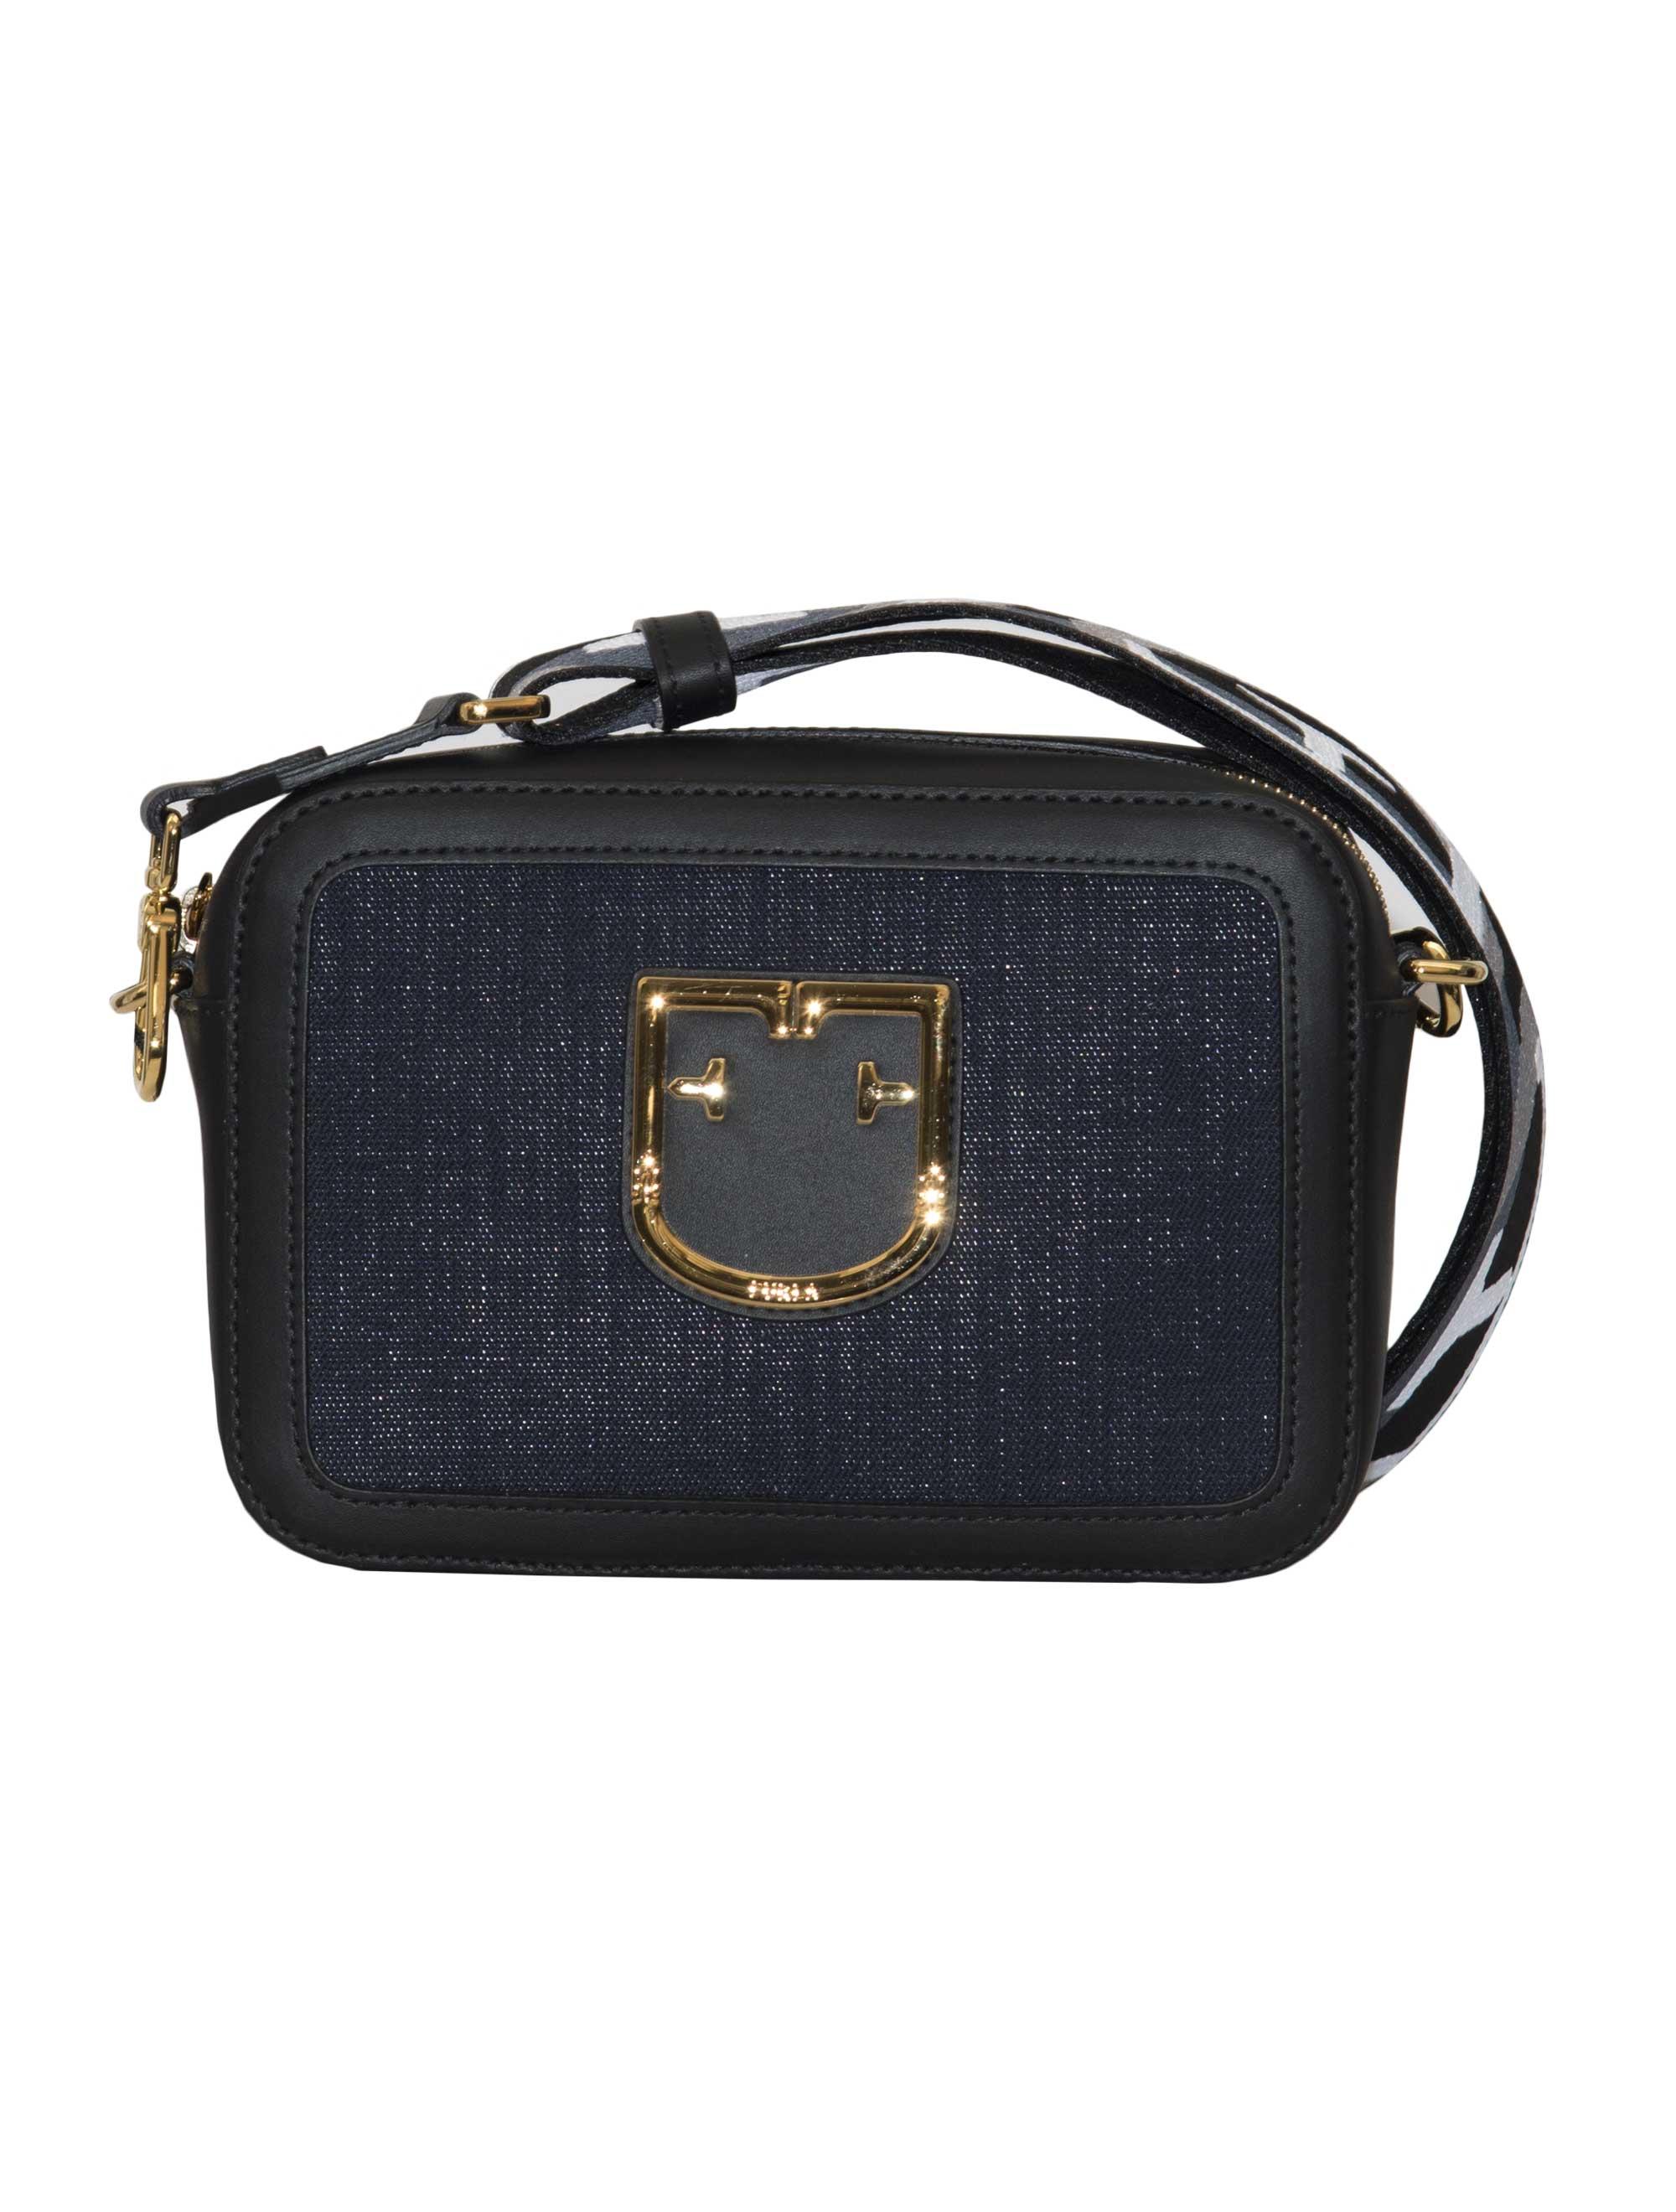 Picture of Furla | Brava Mini Crossbody Bag